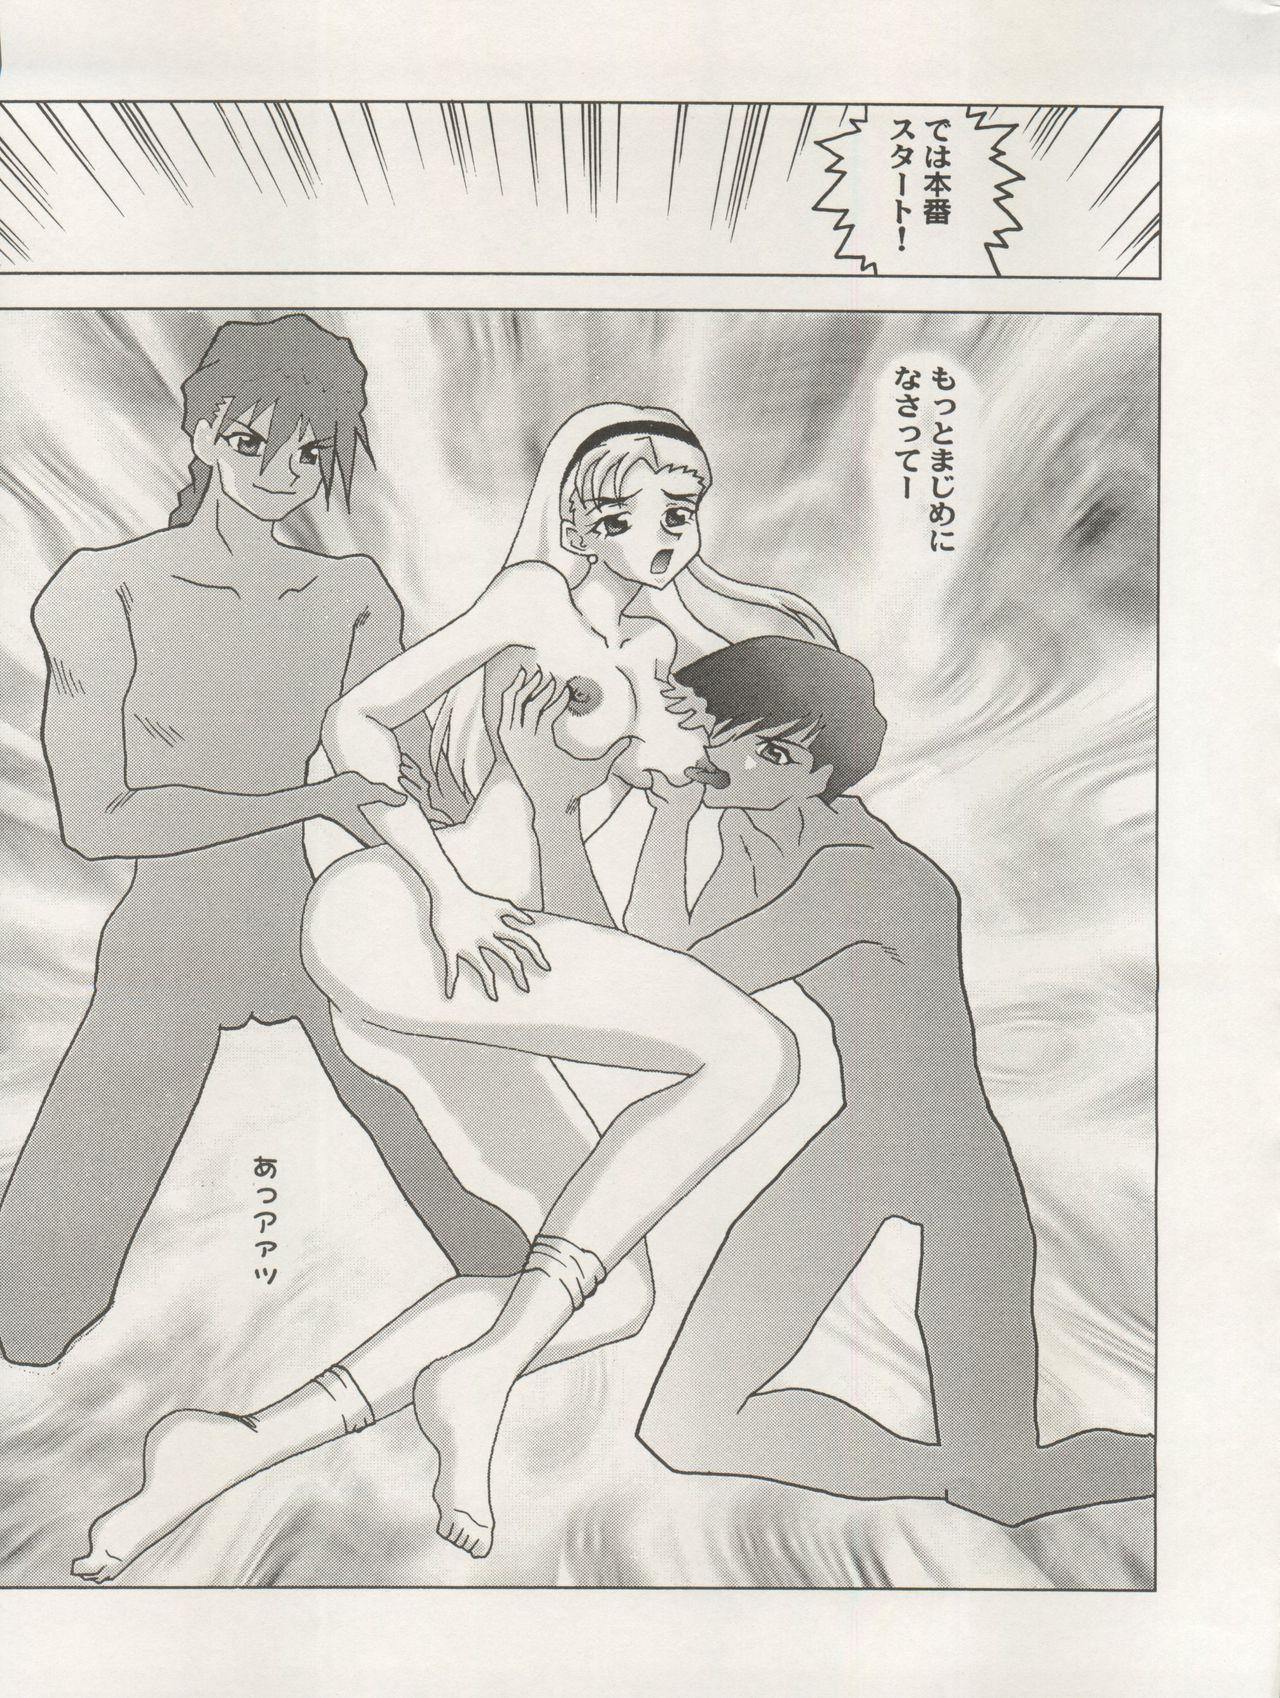 NEXT Climax Magazine 3 Gundam Series 26